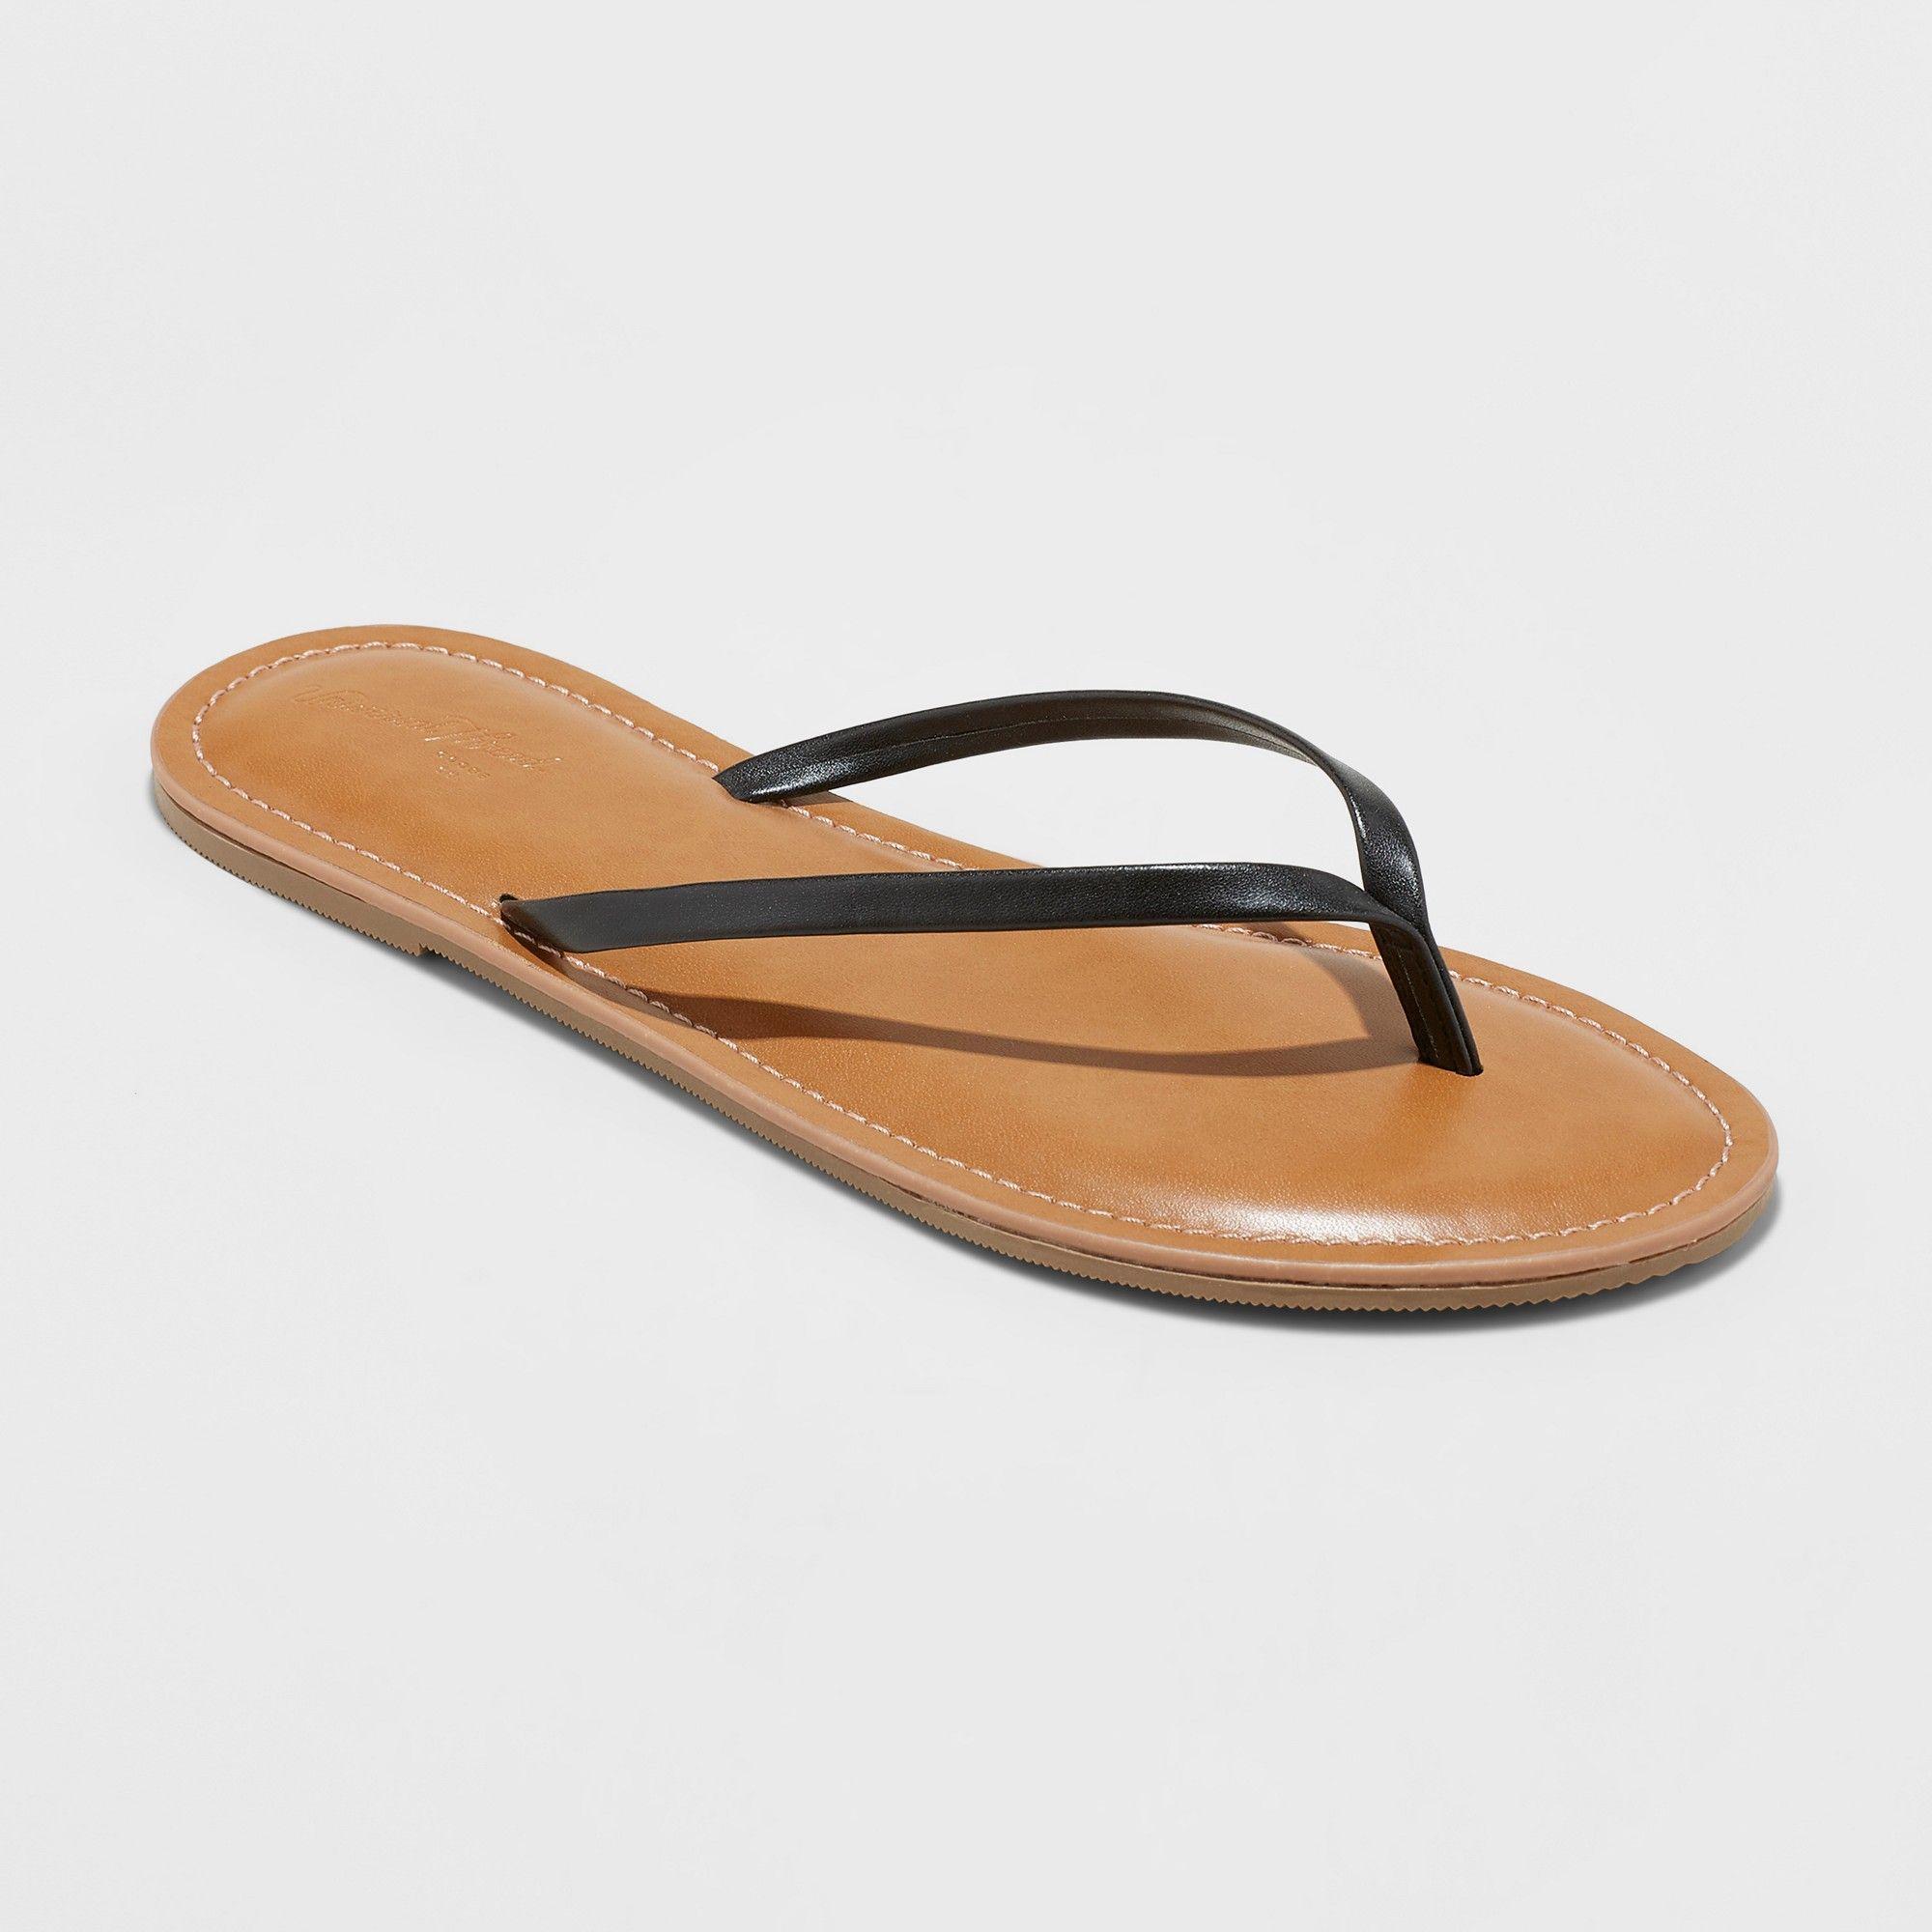 2eb75d901d0 Women s Rowen Flip Flop Sandal - Universal Thread Black 11 ...